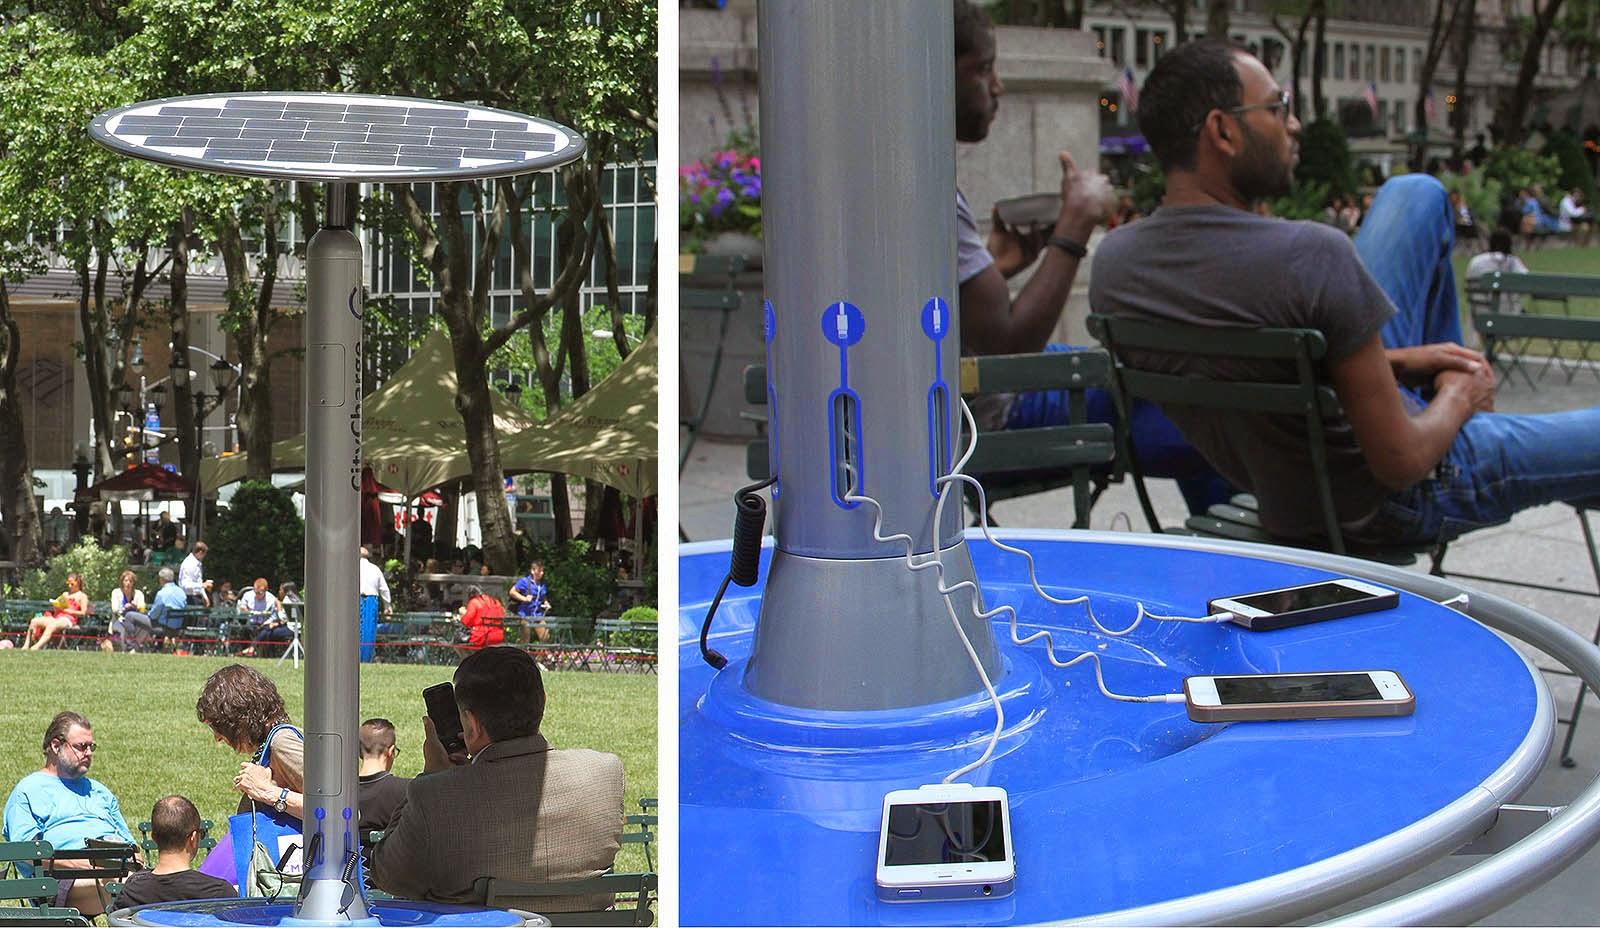 Bryant Park In New York City Begins Testing Solar Powered